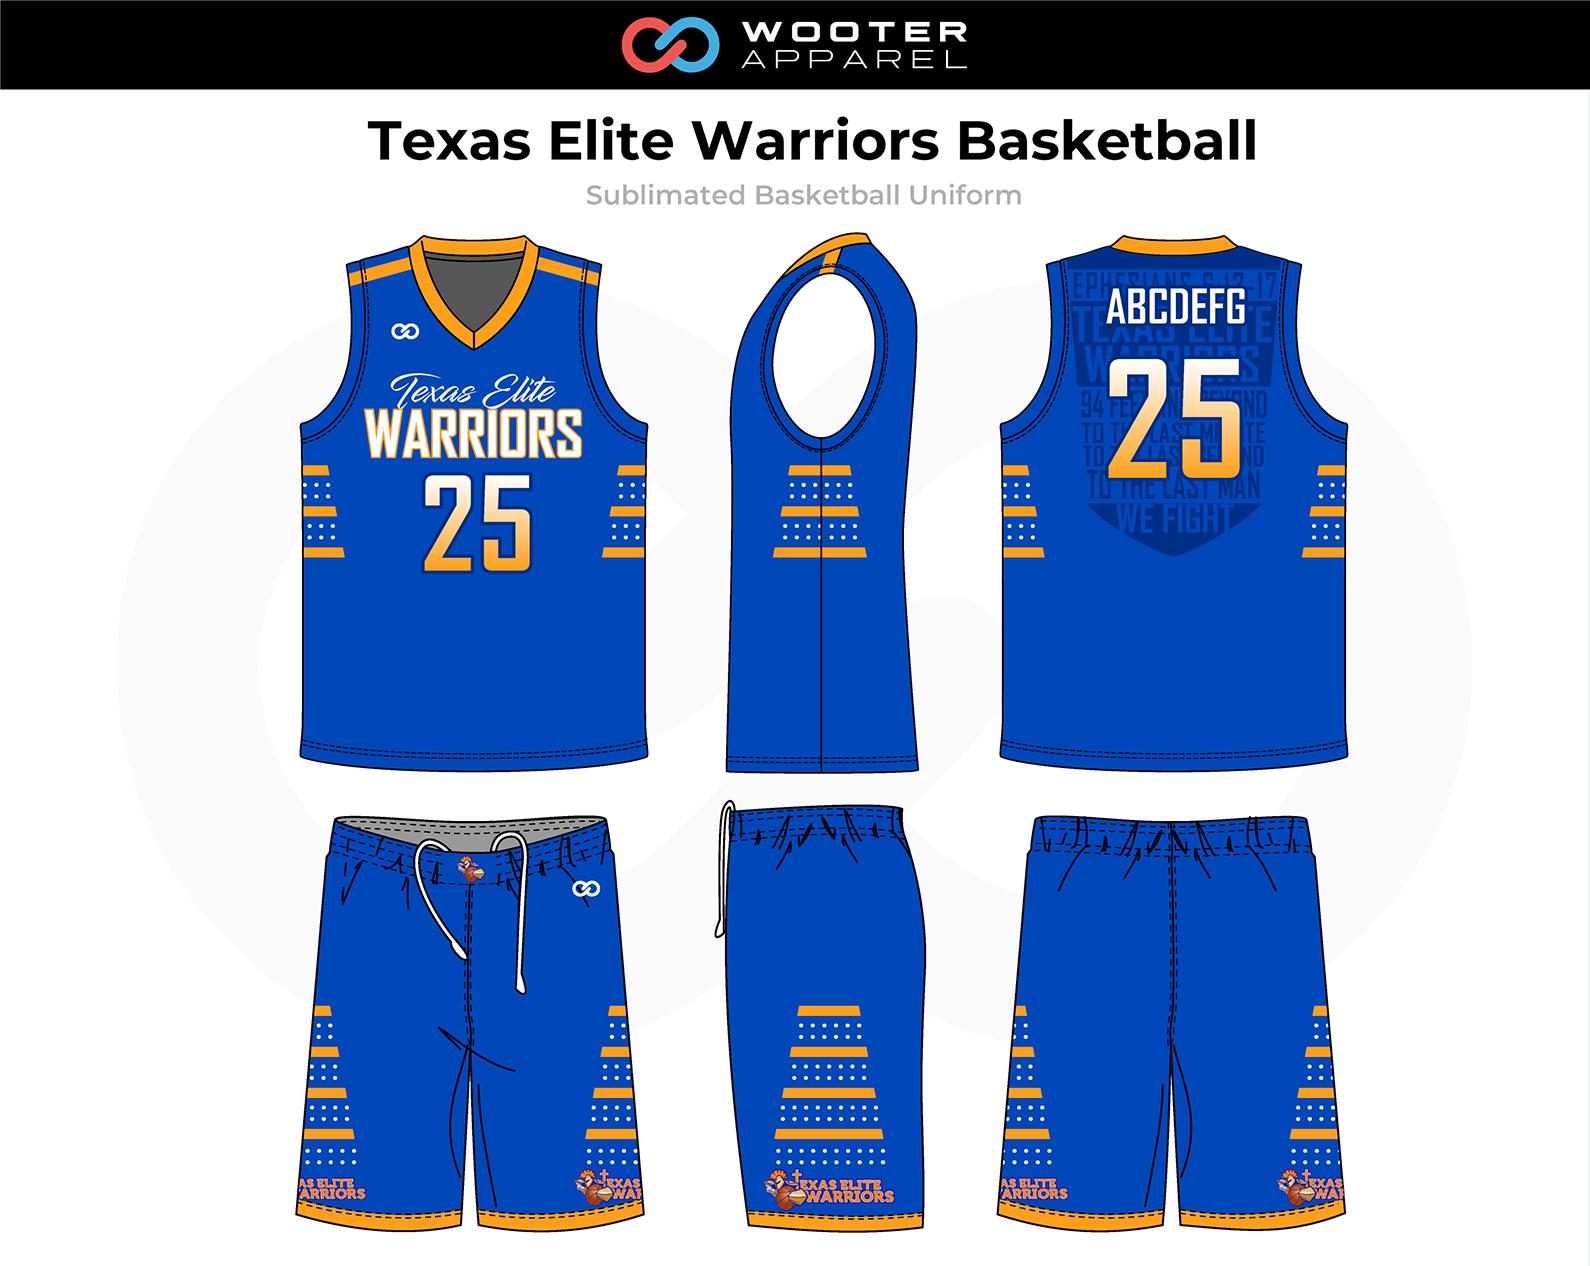 2018-11-08 Texas Elite Warriors Basketball Uniform (Blue).png